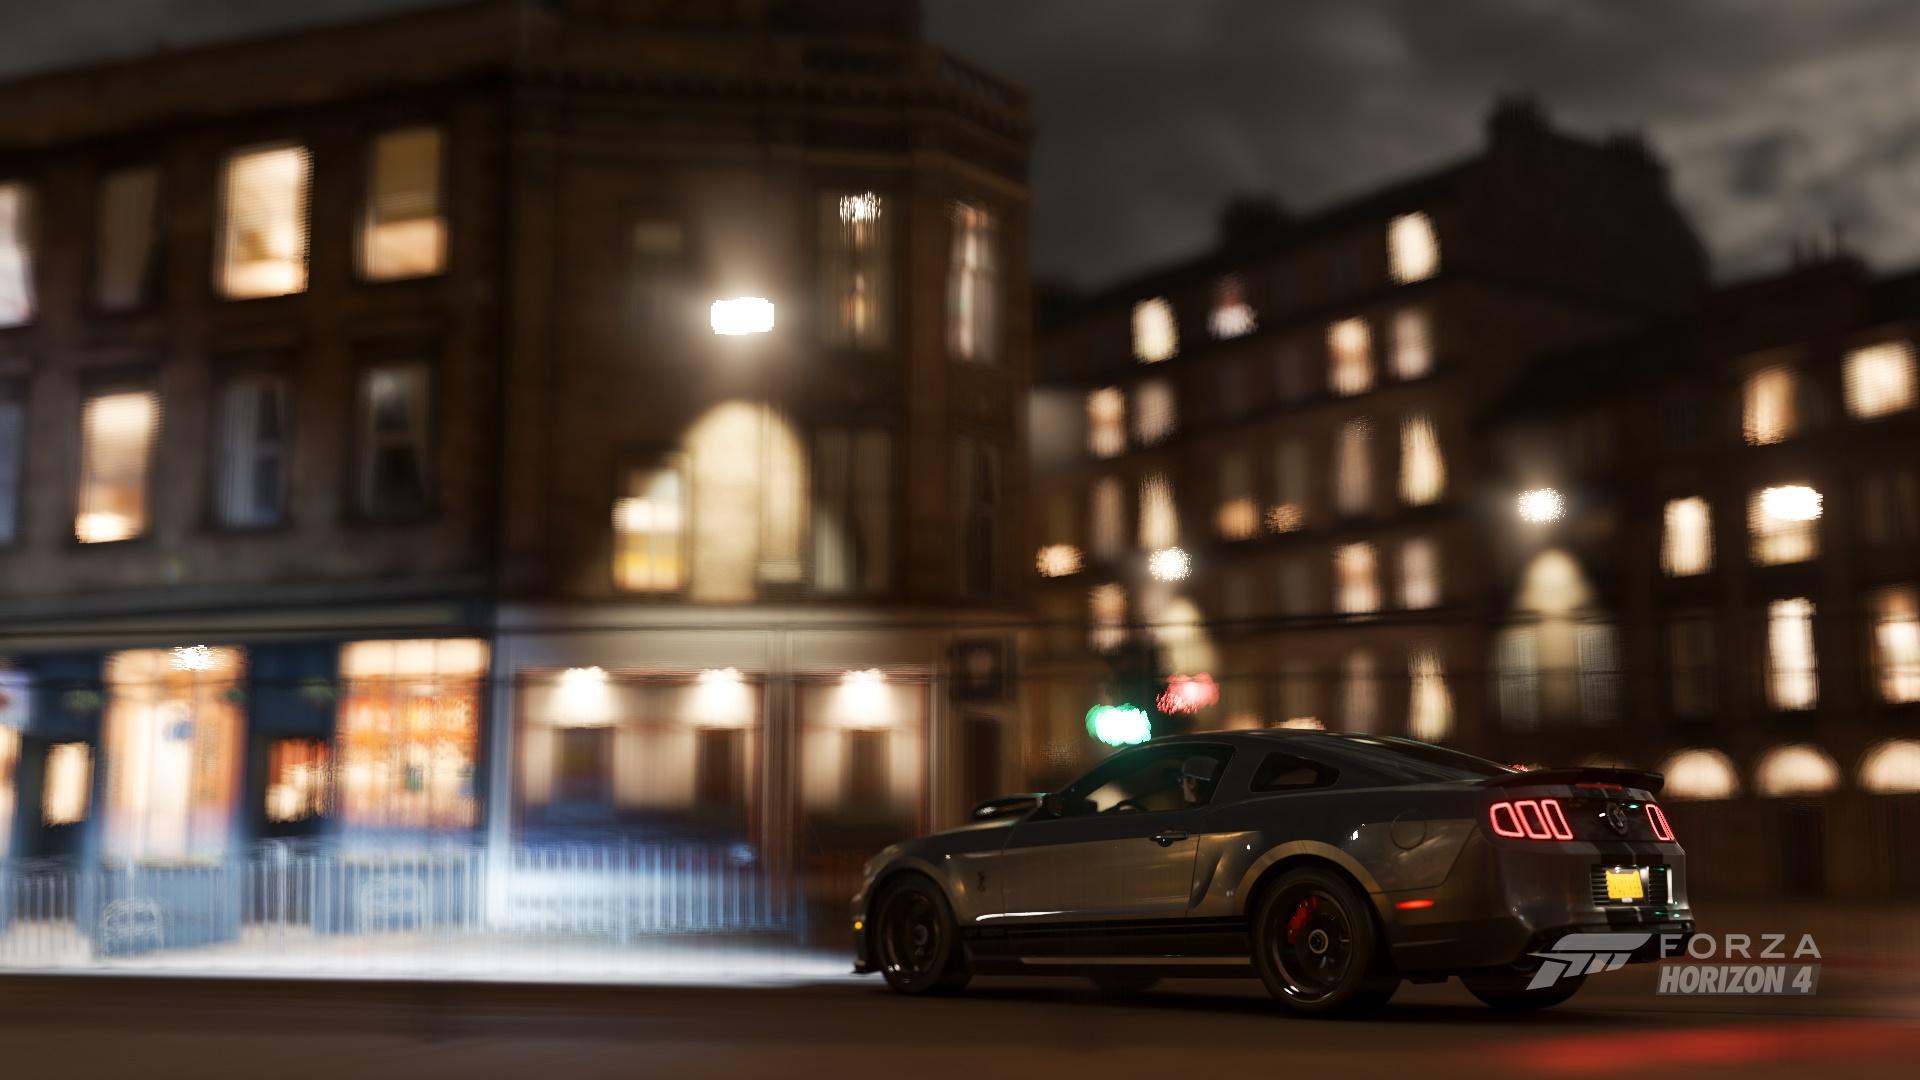 Forza Horizon 4 Ford Mustang Night City Car 1920x1080